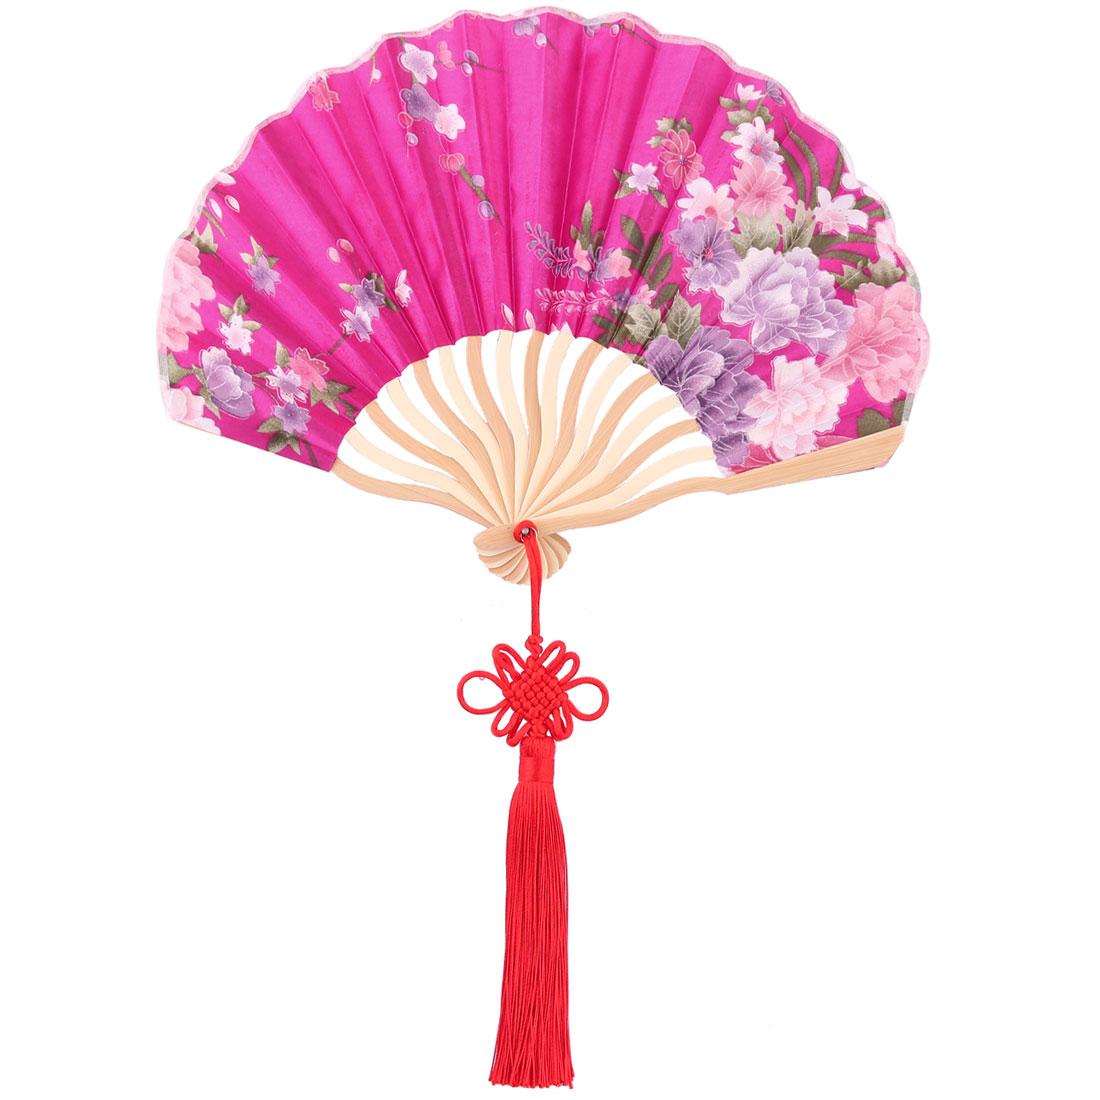 Bamboo Frame Chinese Knot Tassel Pendant Decor Dancing Folding Hand Fan Fuchsia